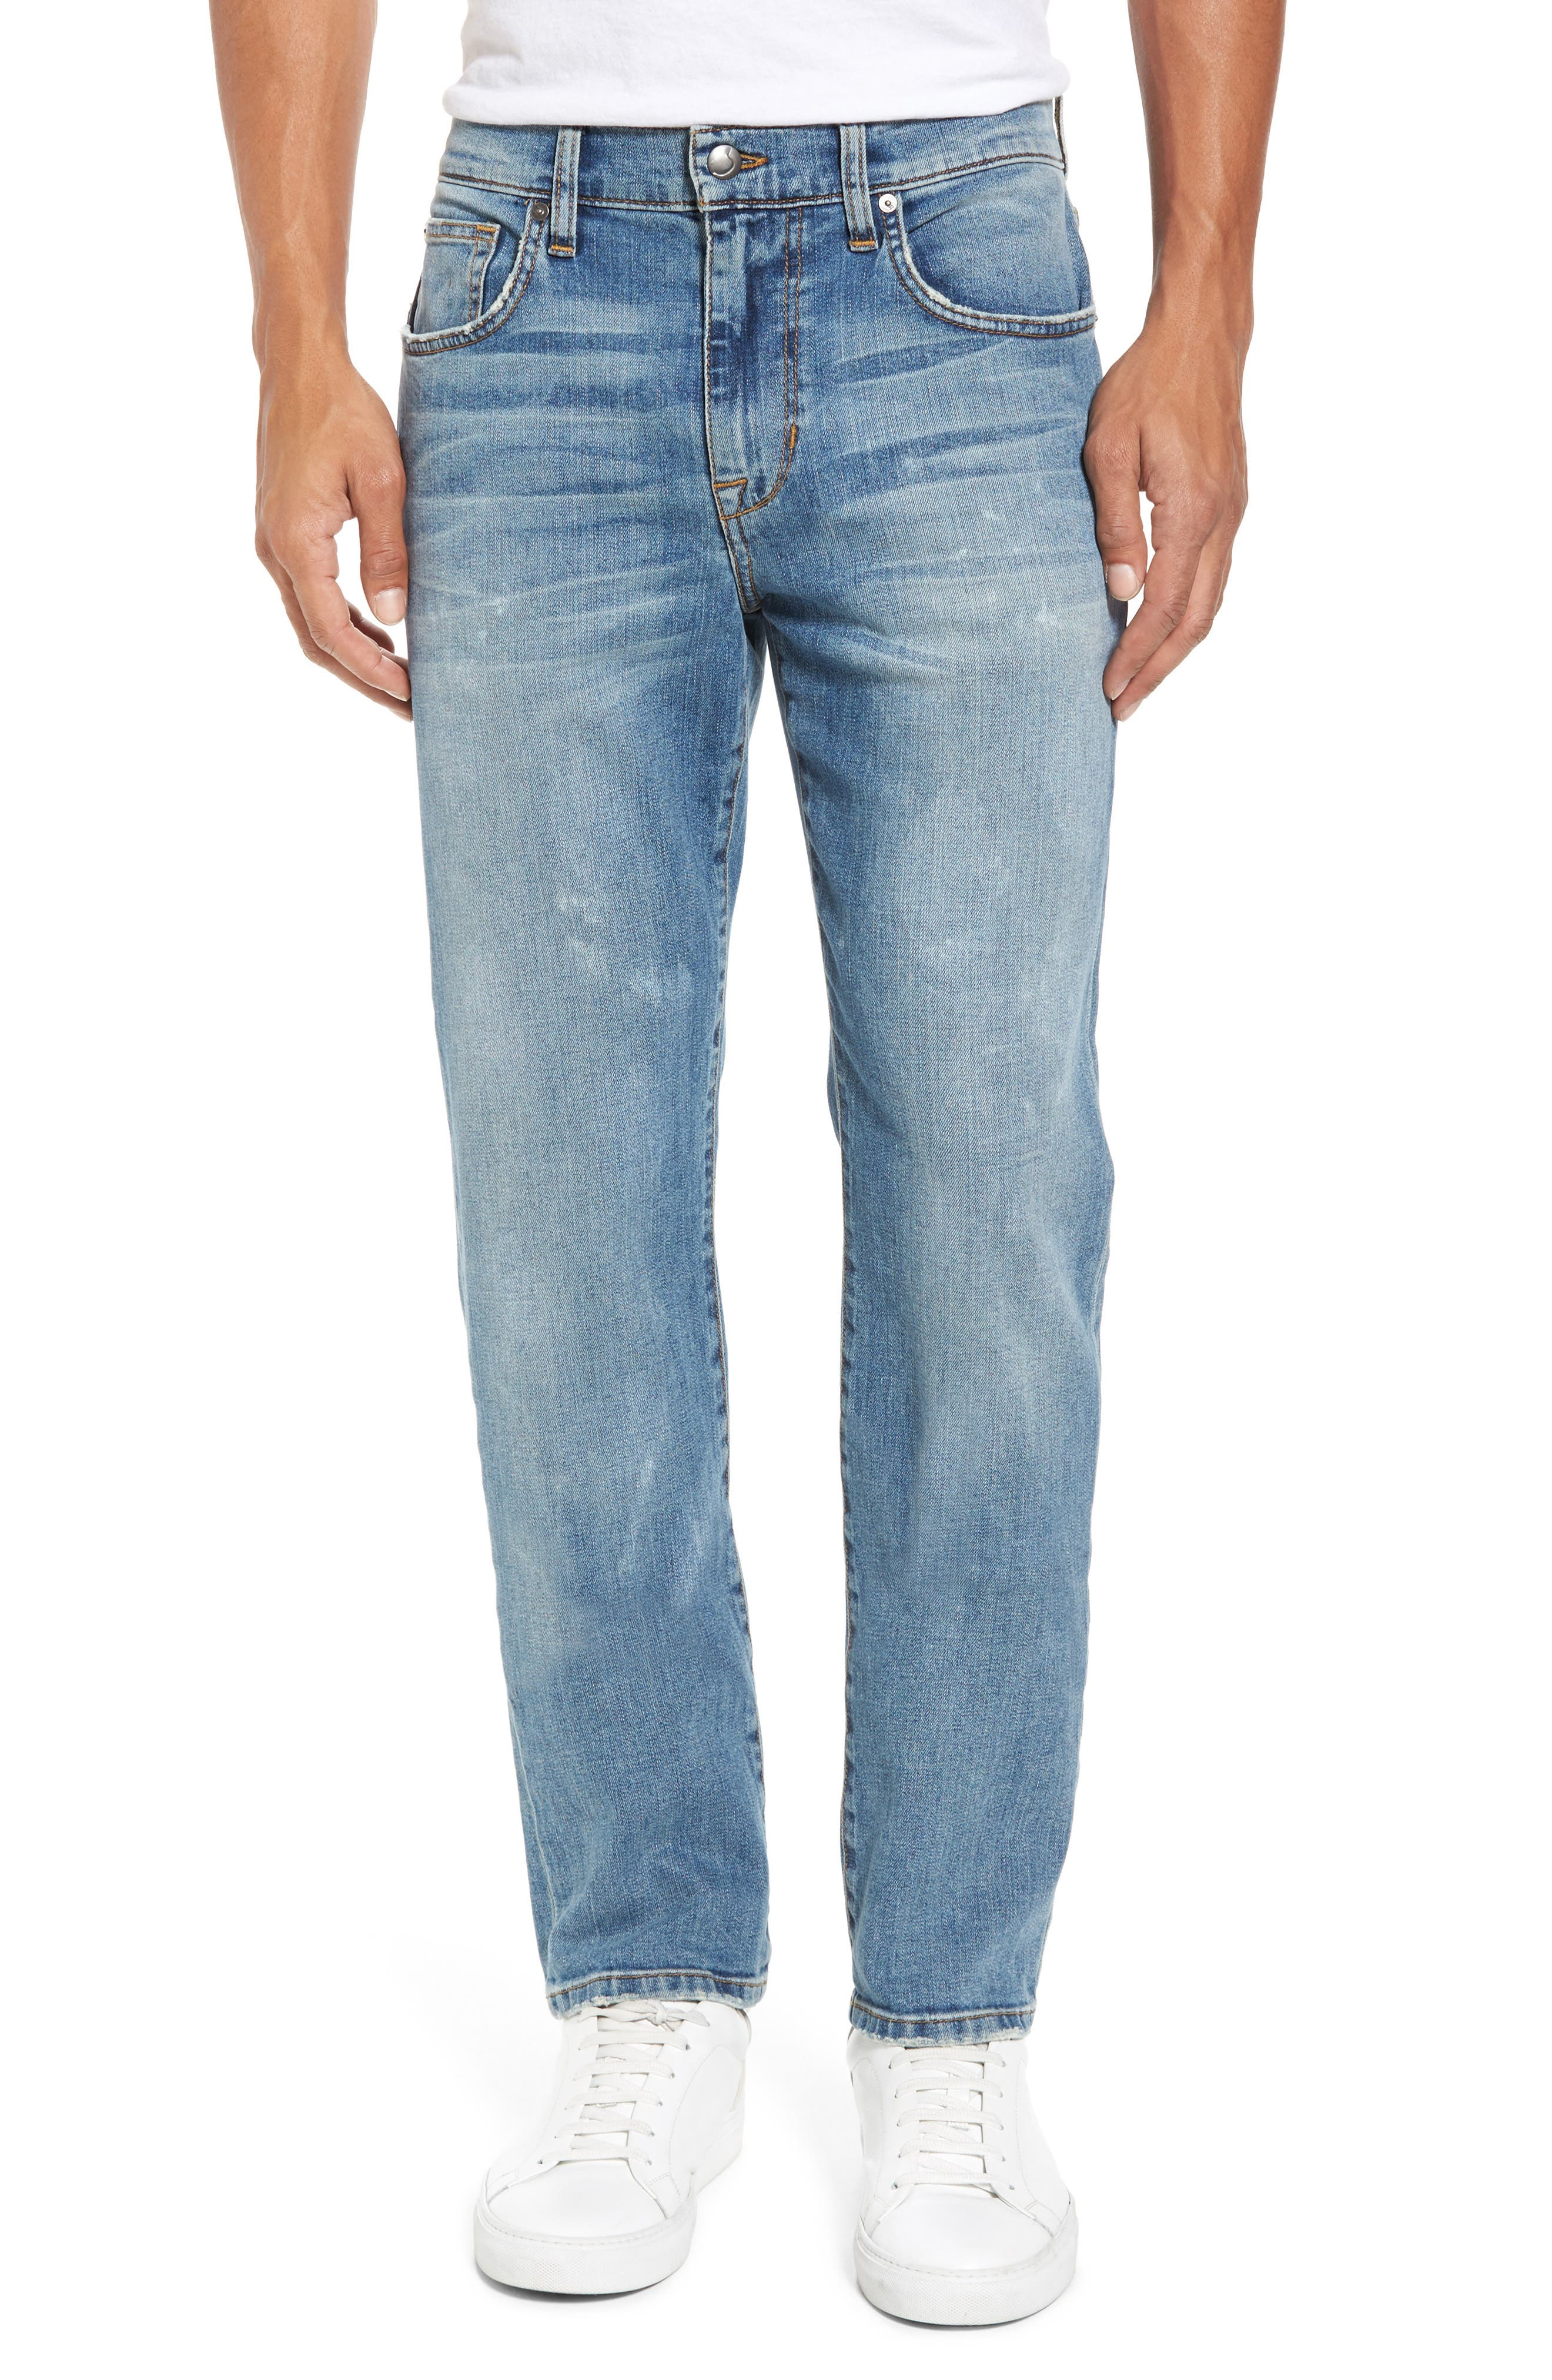 Brixton Slim Straight Fit Jeans,                         Main,                         color, Wyman